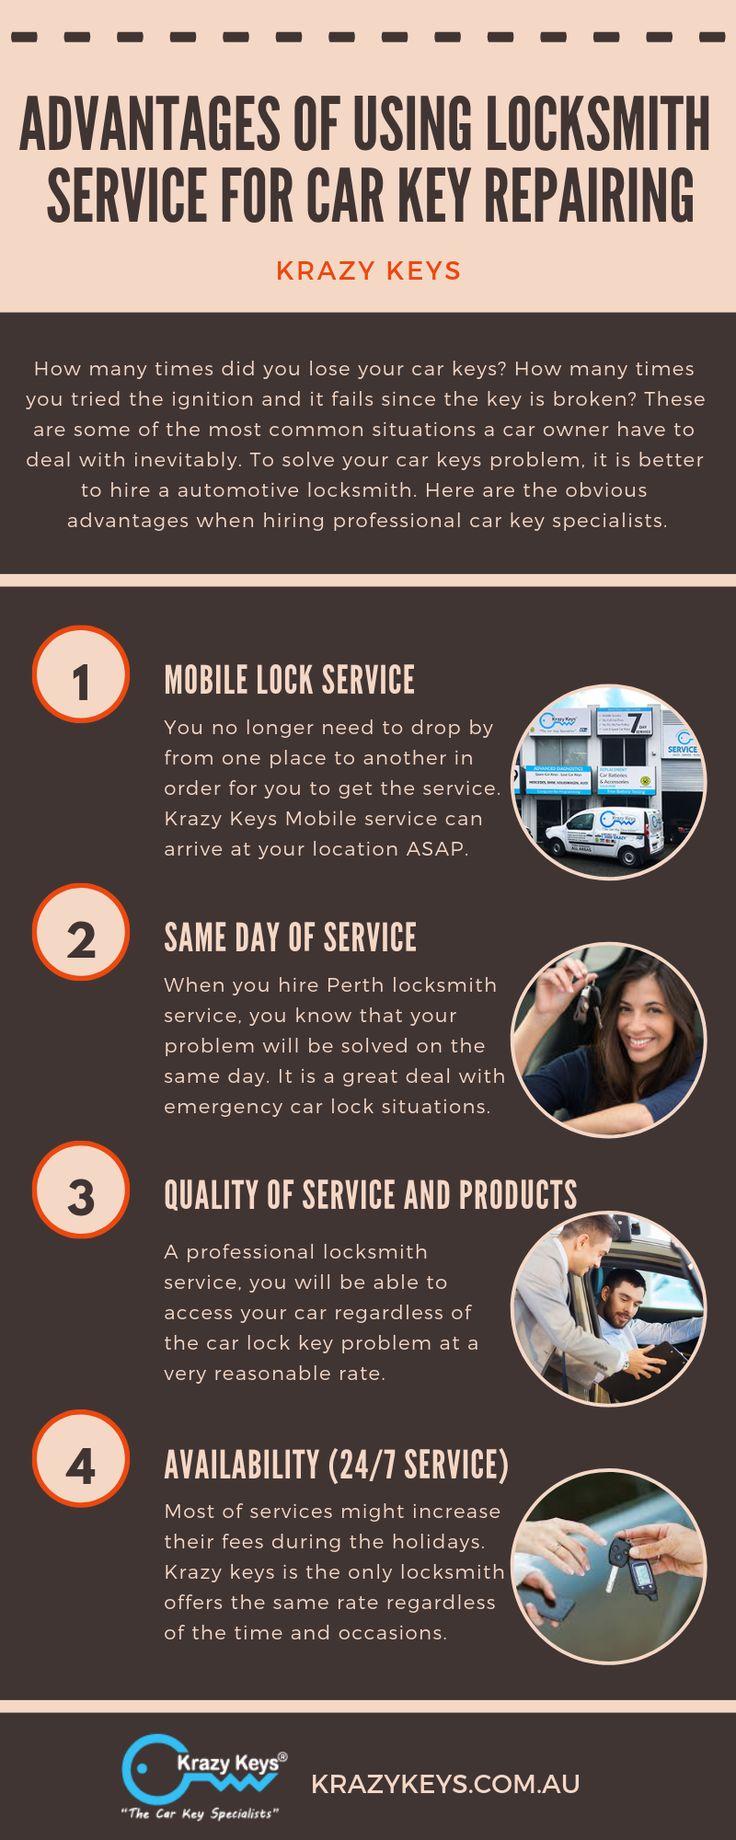 Advantages of using locksmith service for car key